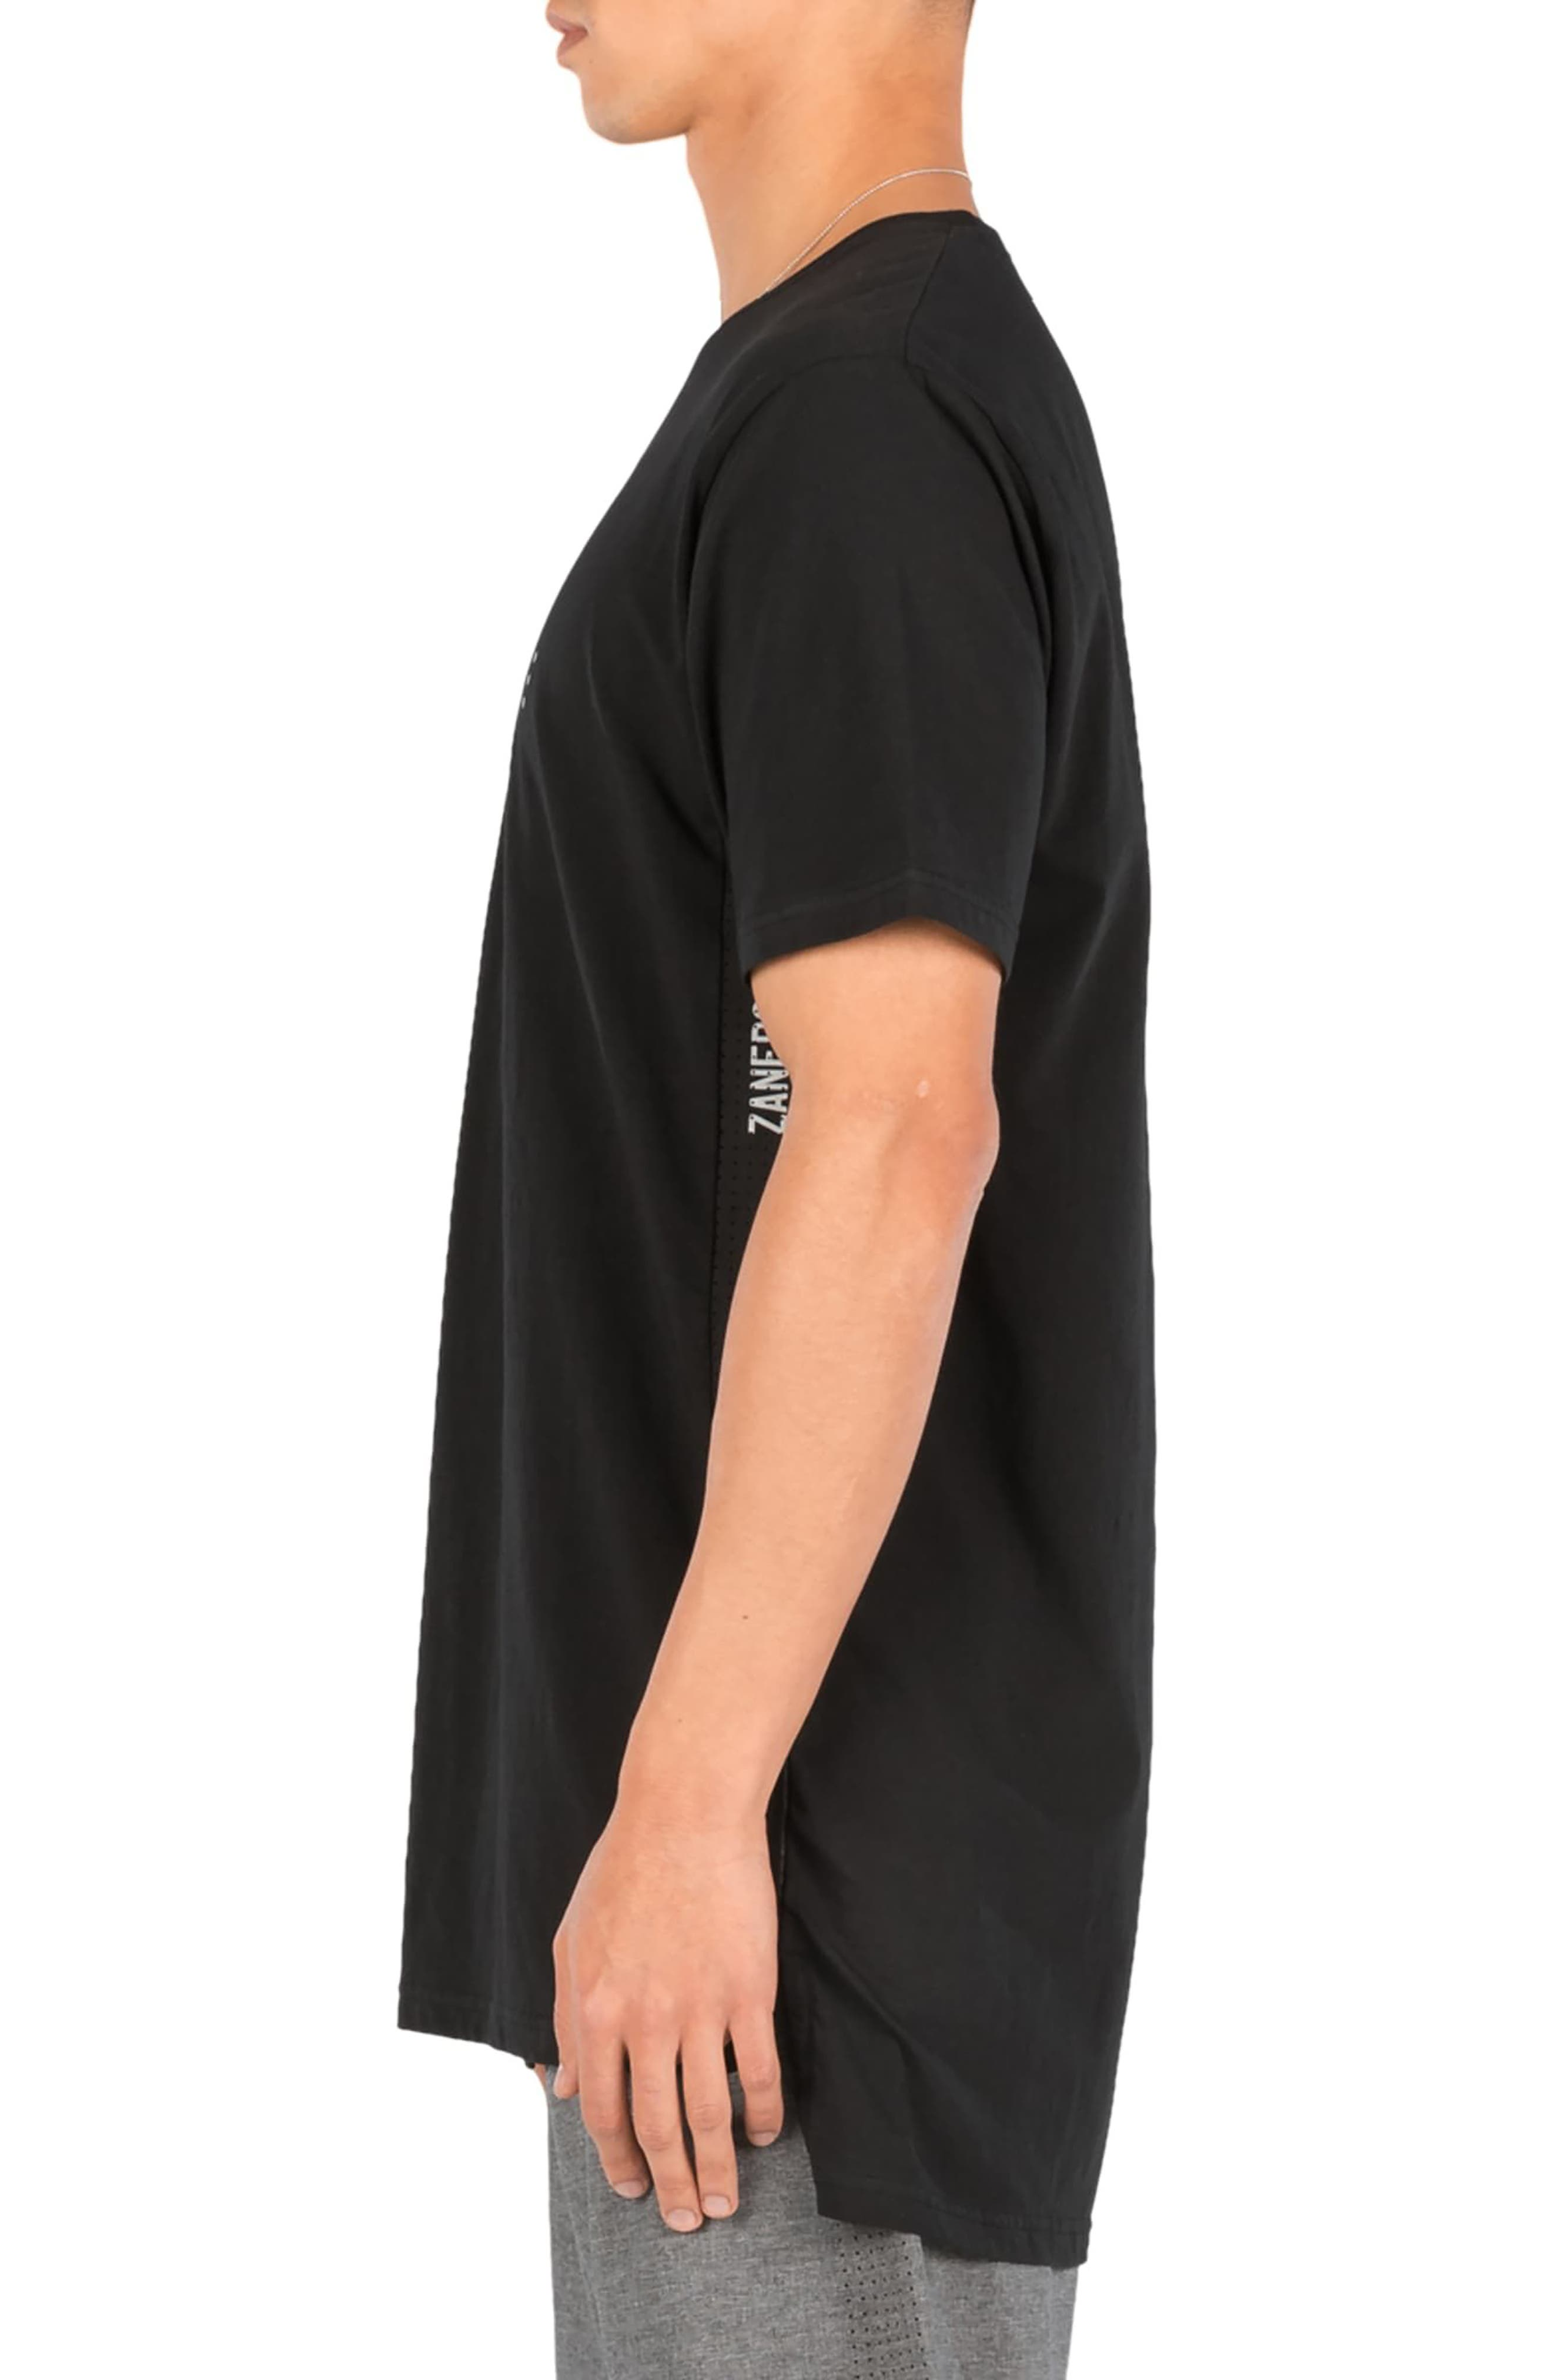 Flintlock Performance T-Shirt,                             Alternate thumbnail 3, color,                             Black